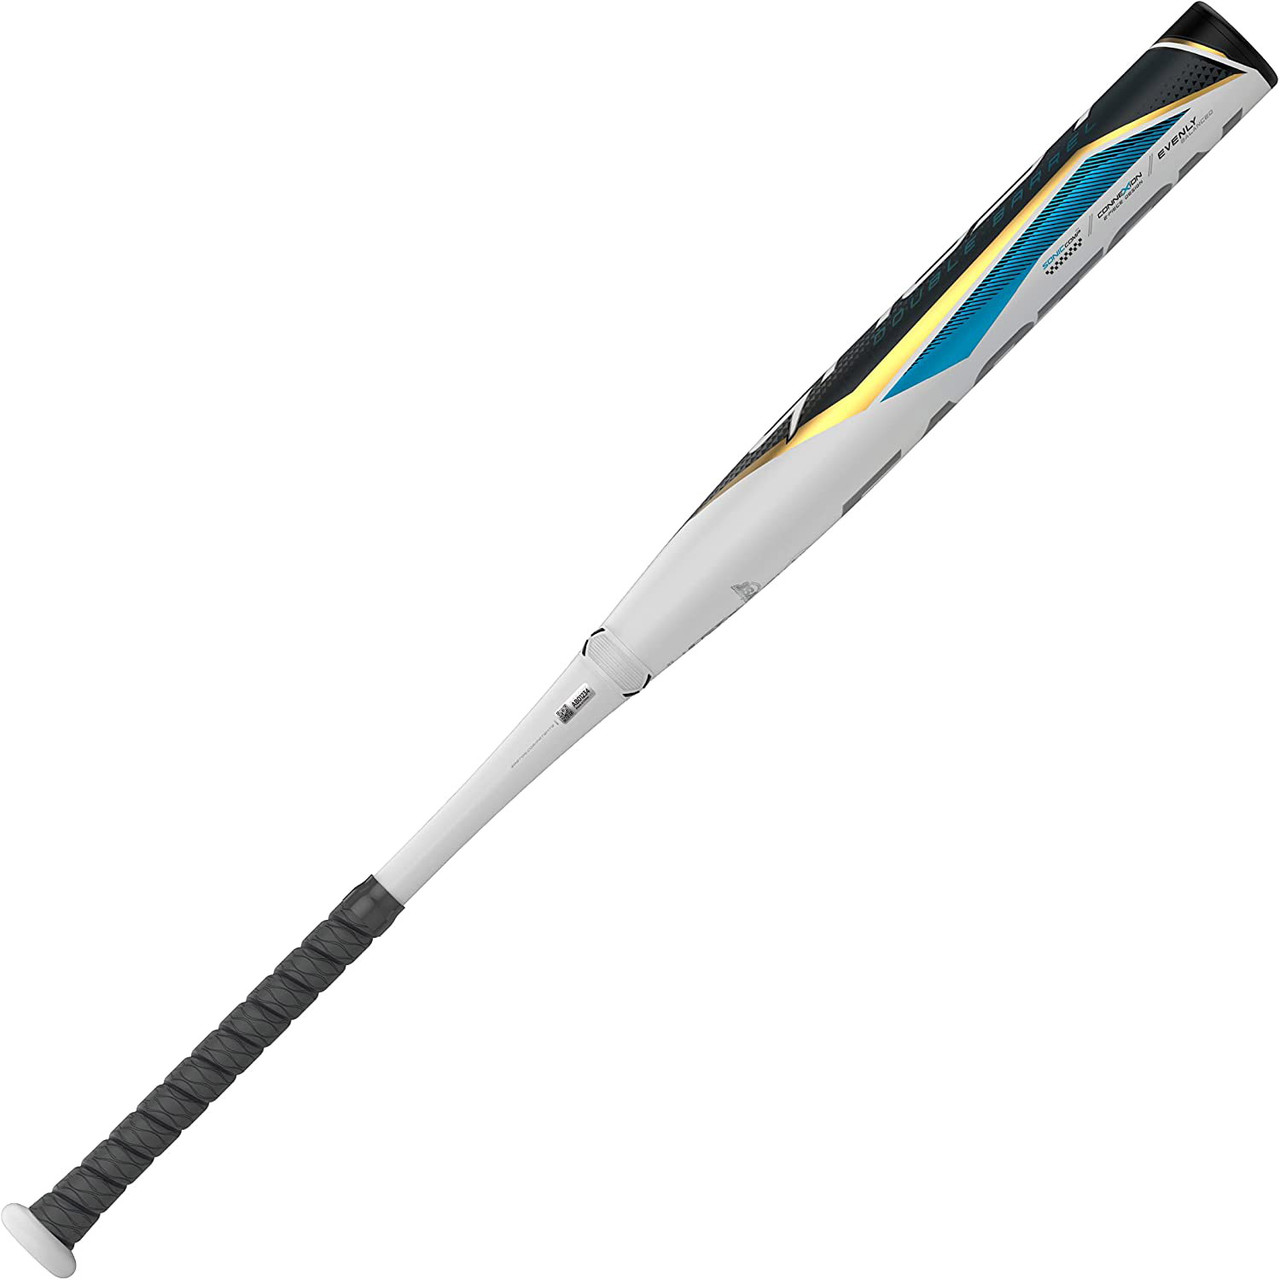 Easton 2022 Ghost Double Barrel (-11) FP22GH11 Fastpitch Softball Bat